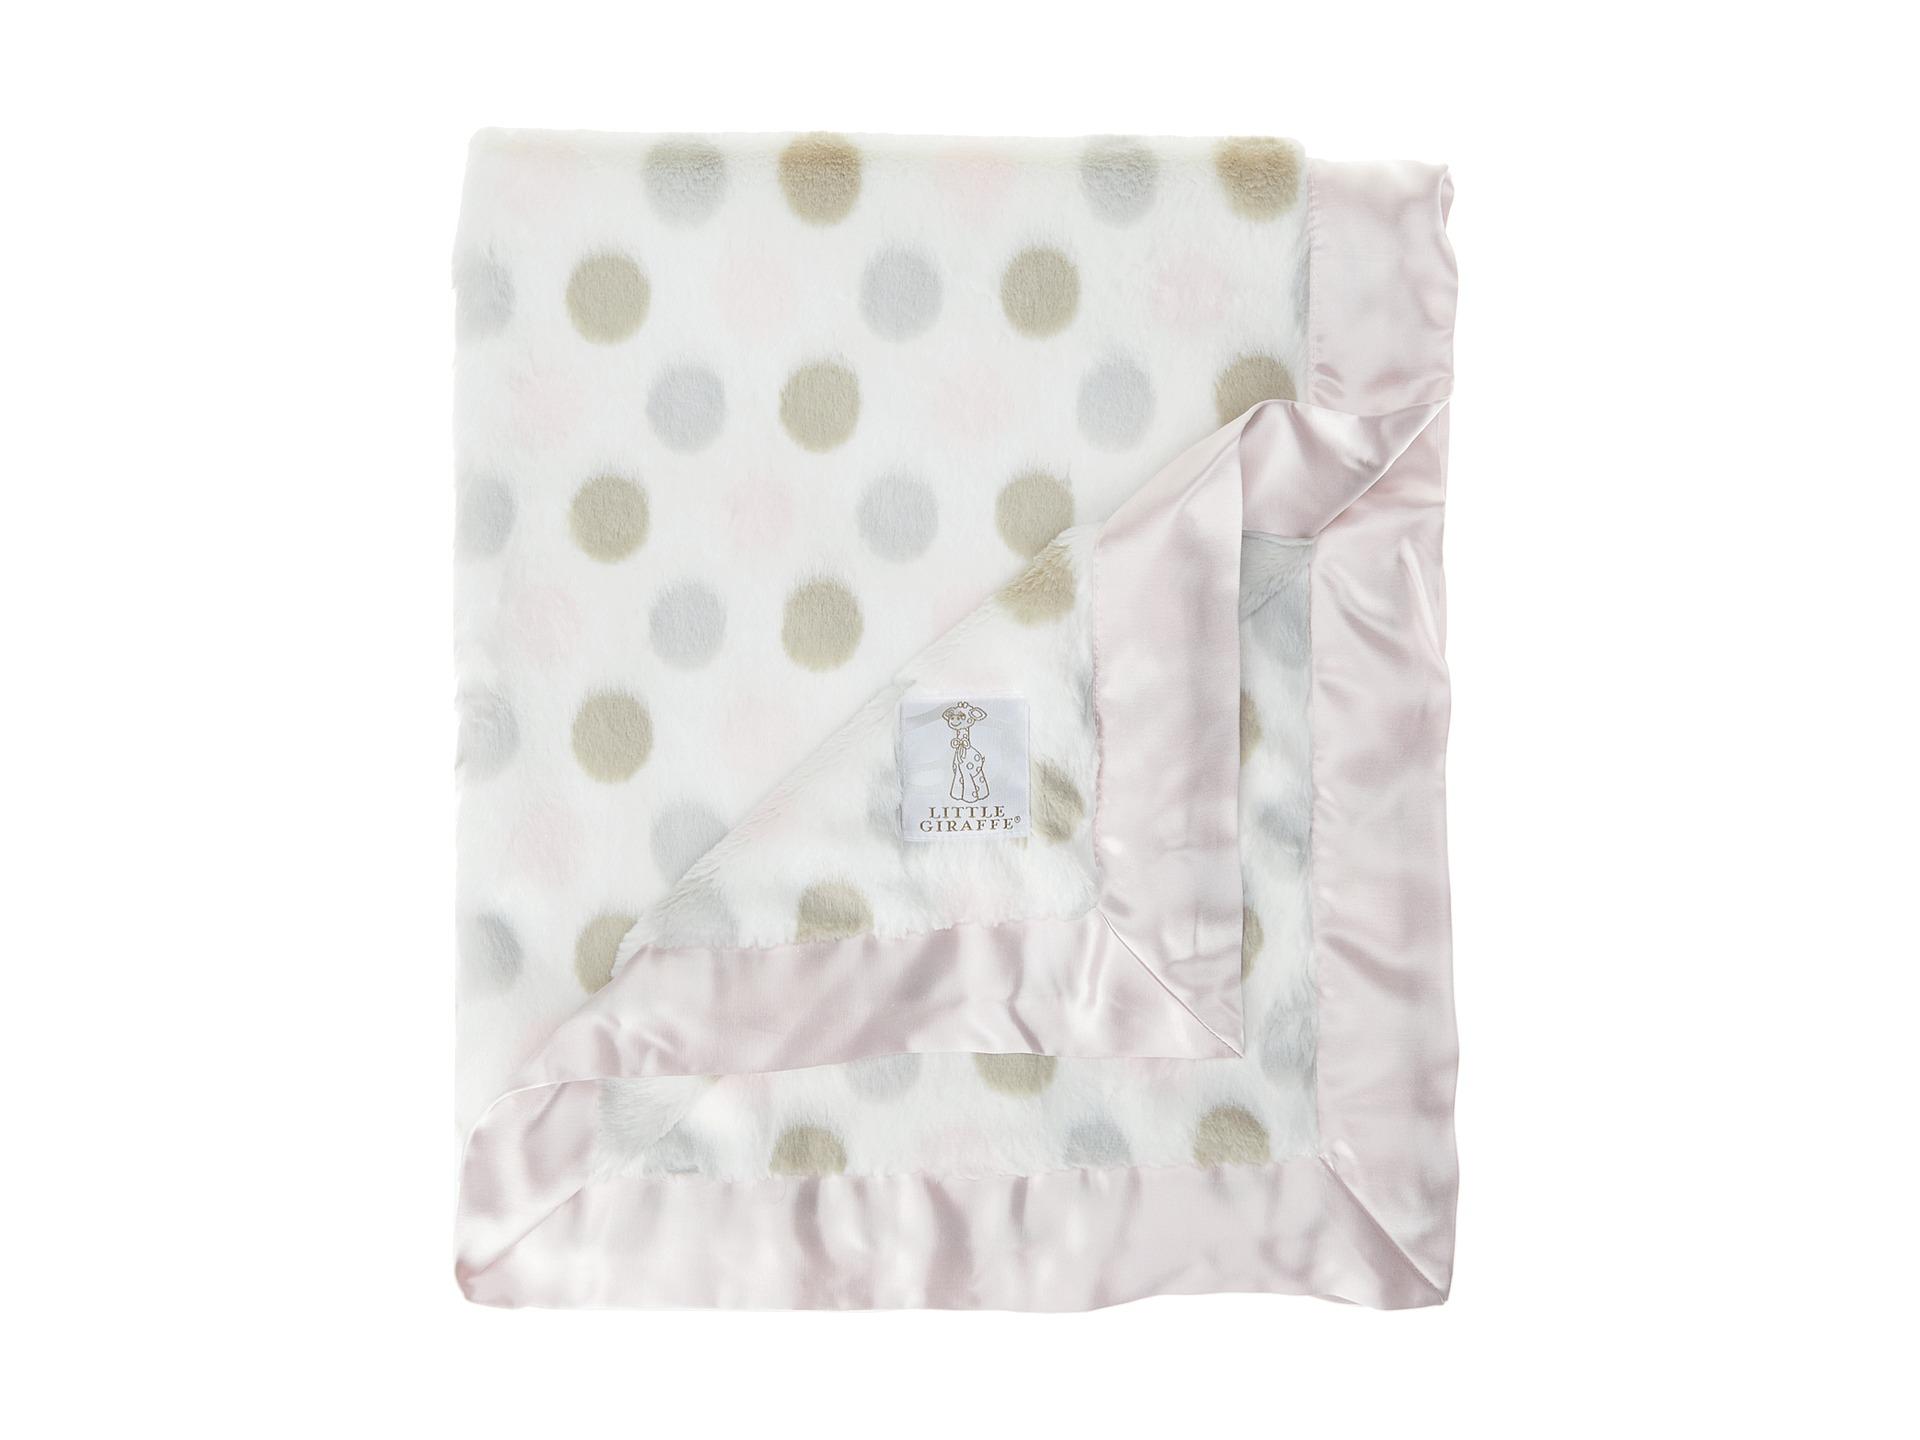 Luxe Giraffe Baby Blanket